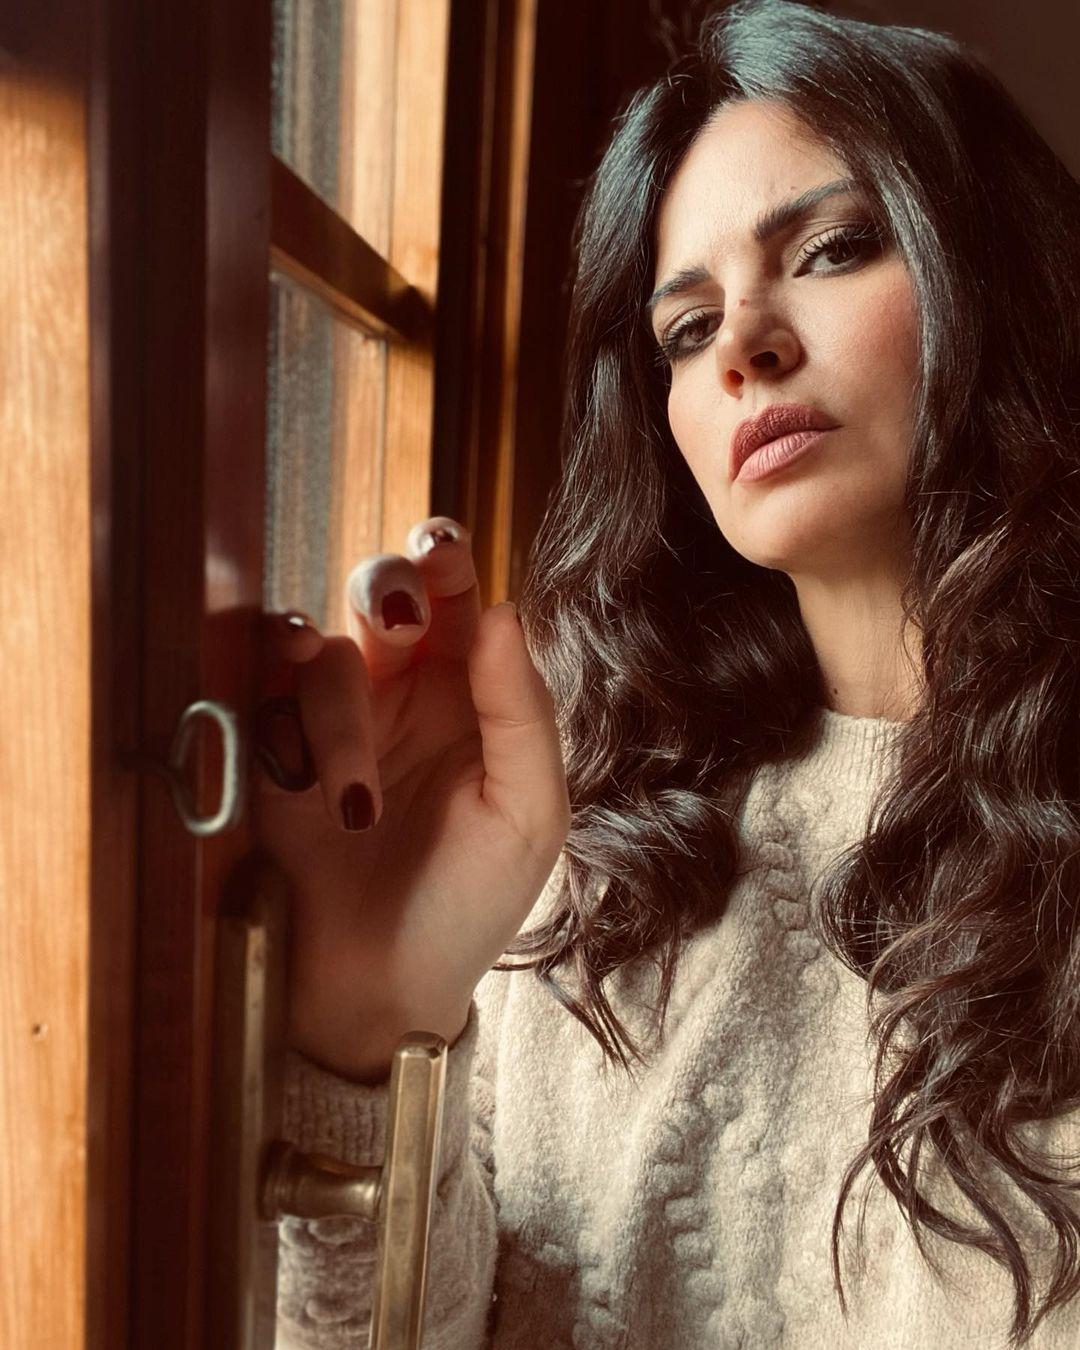 Laura-Torrisi-Wallpapers-Insta-Fit-Bio-8